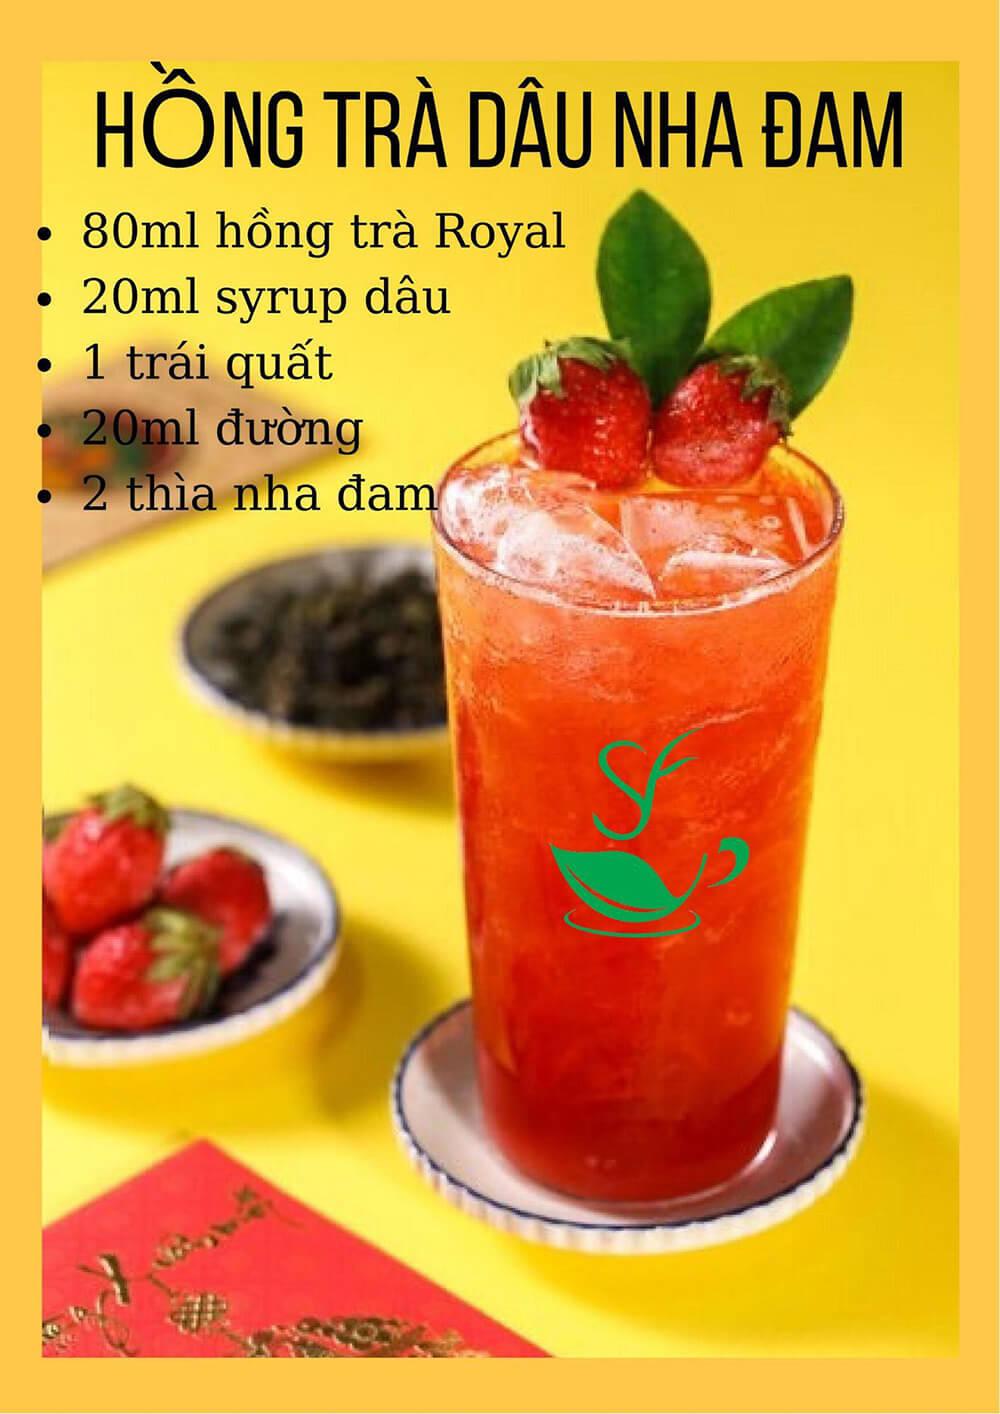 hong-tra-nha-dam-cam